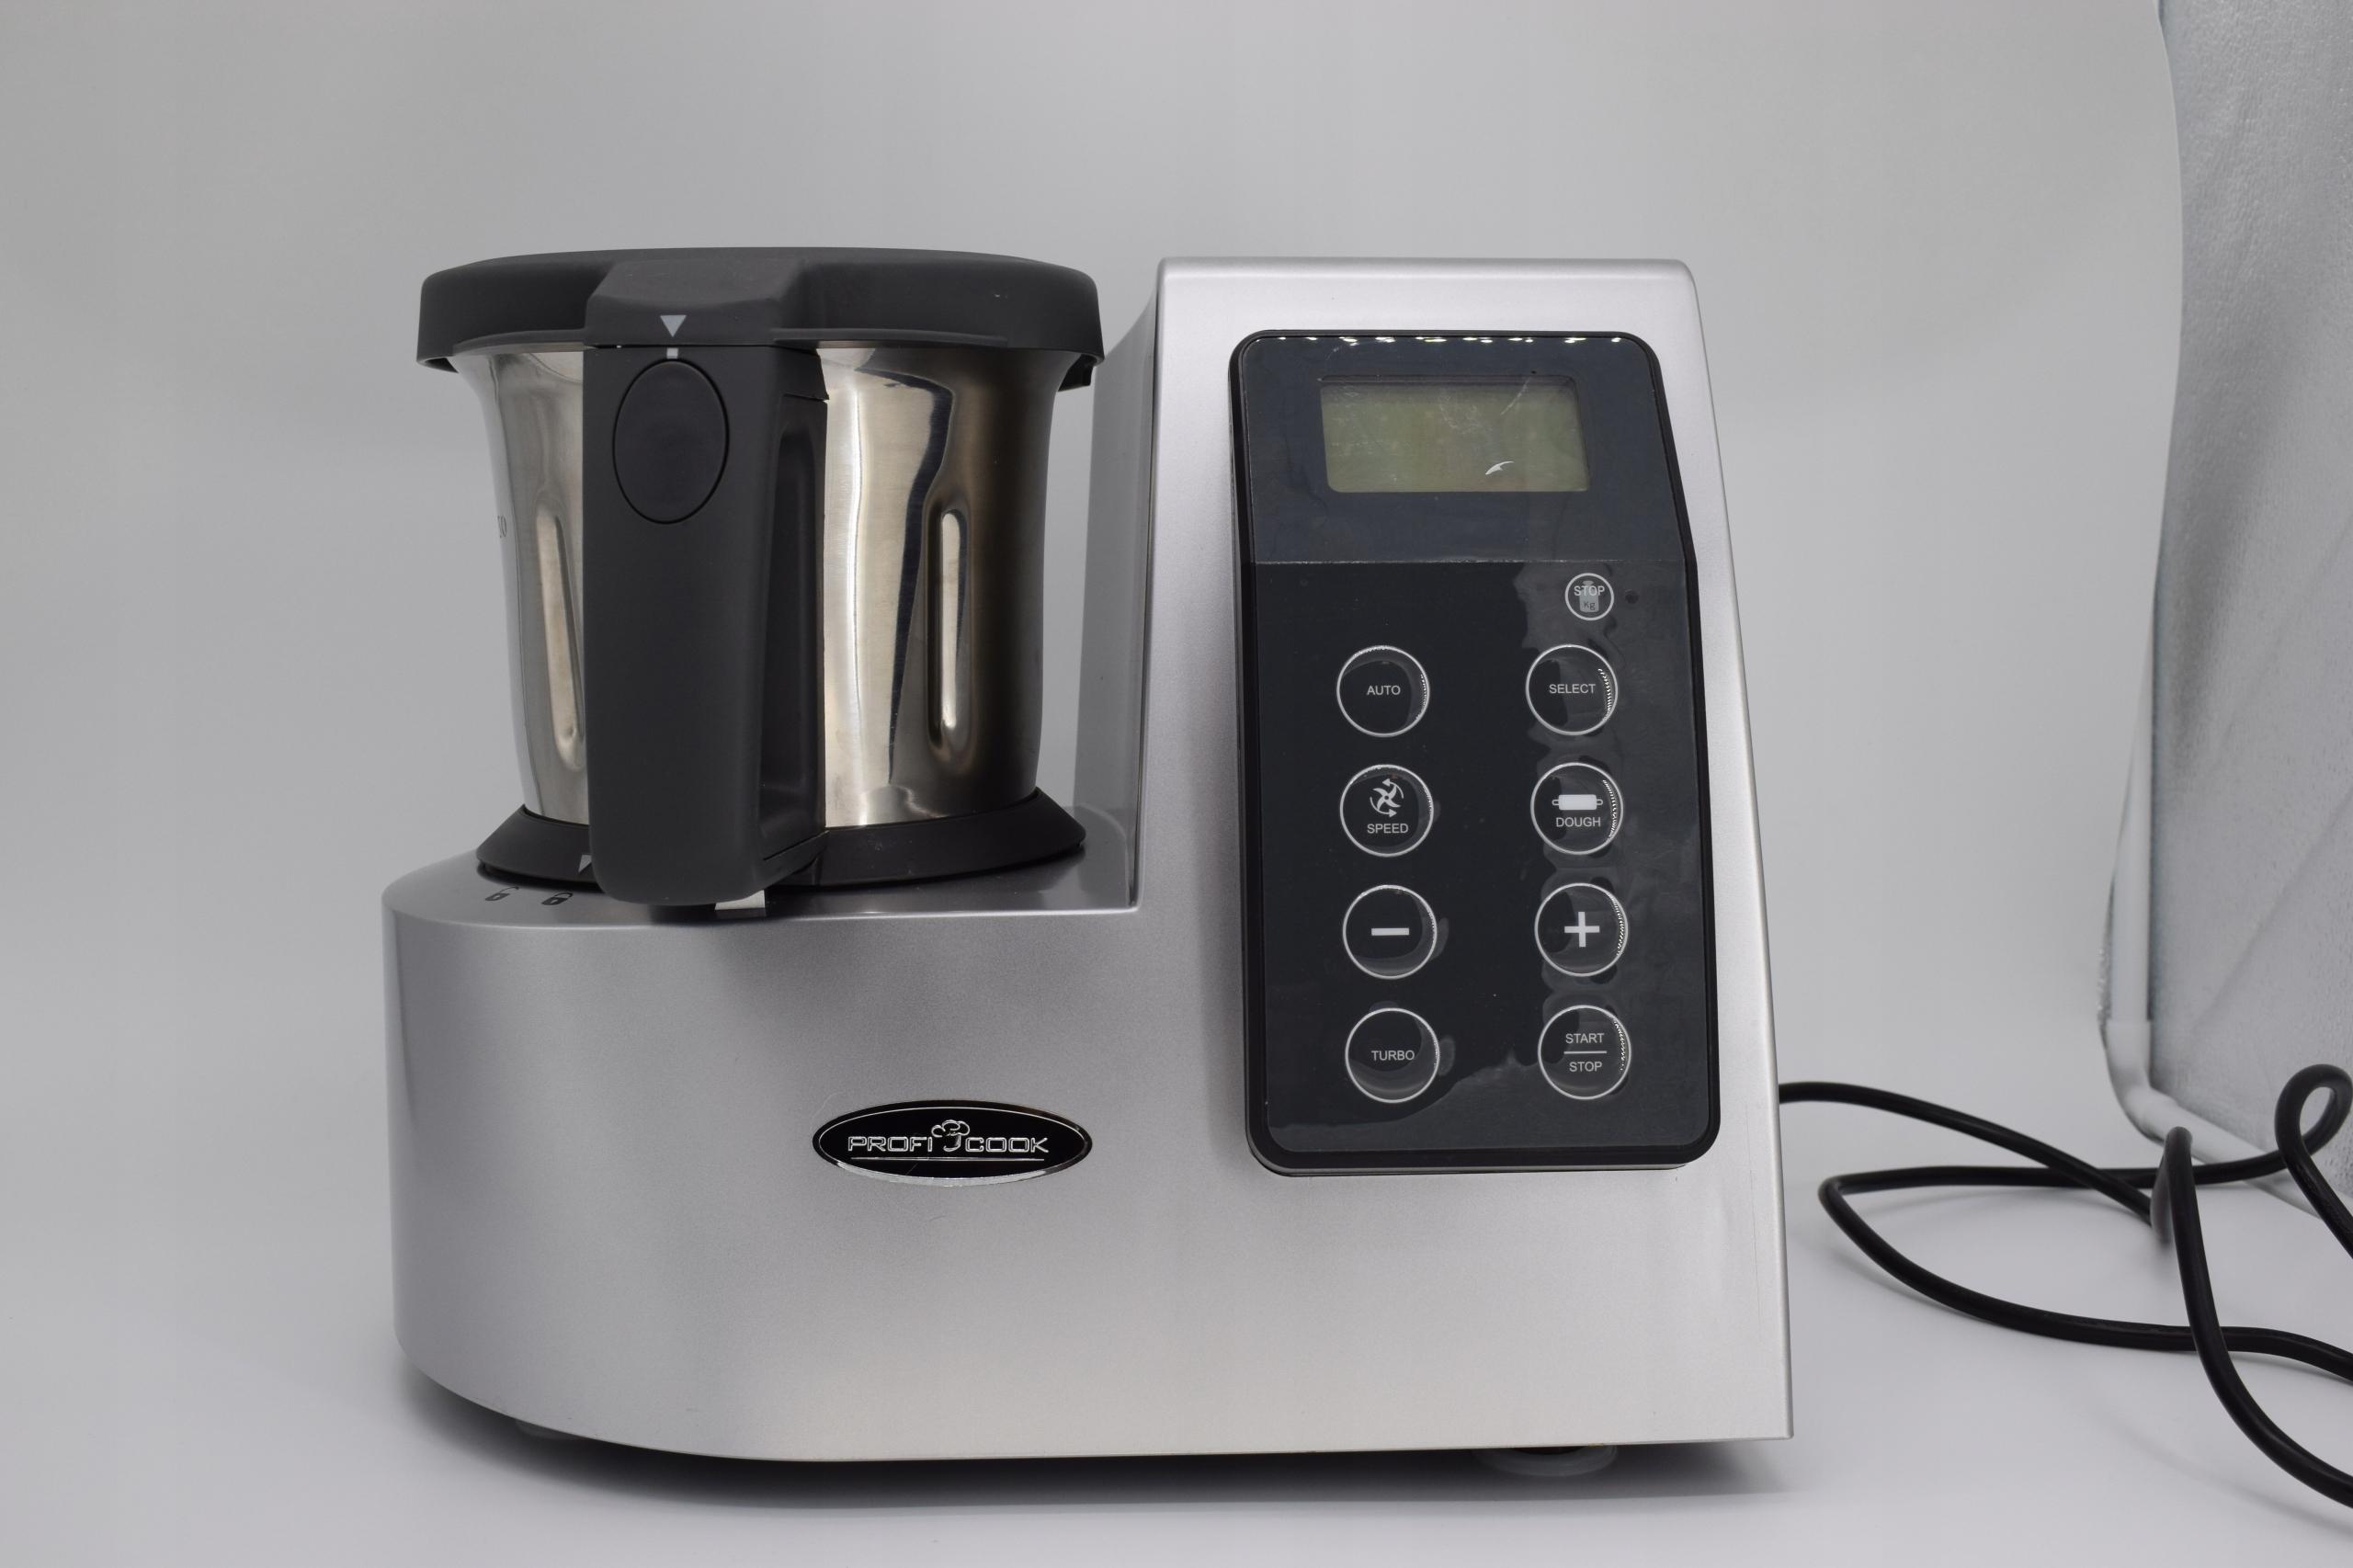 Robot kuchenny Profi cook jak termomix,